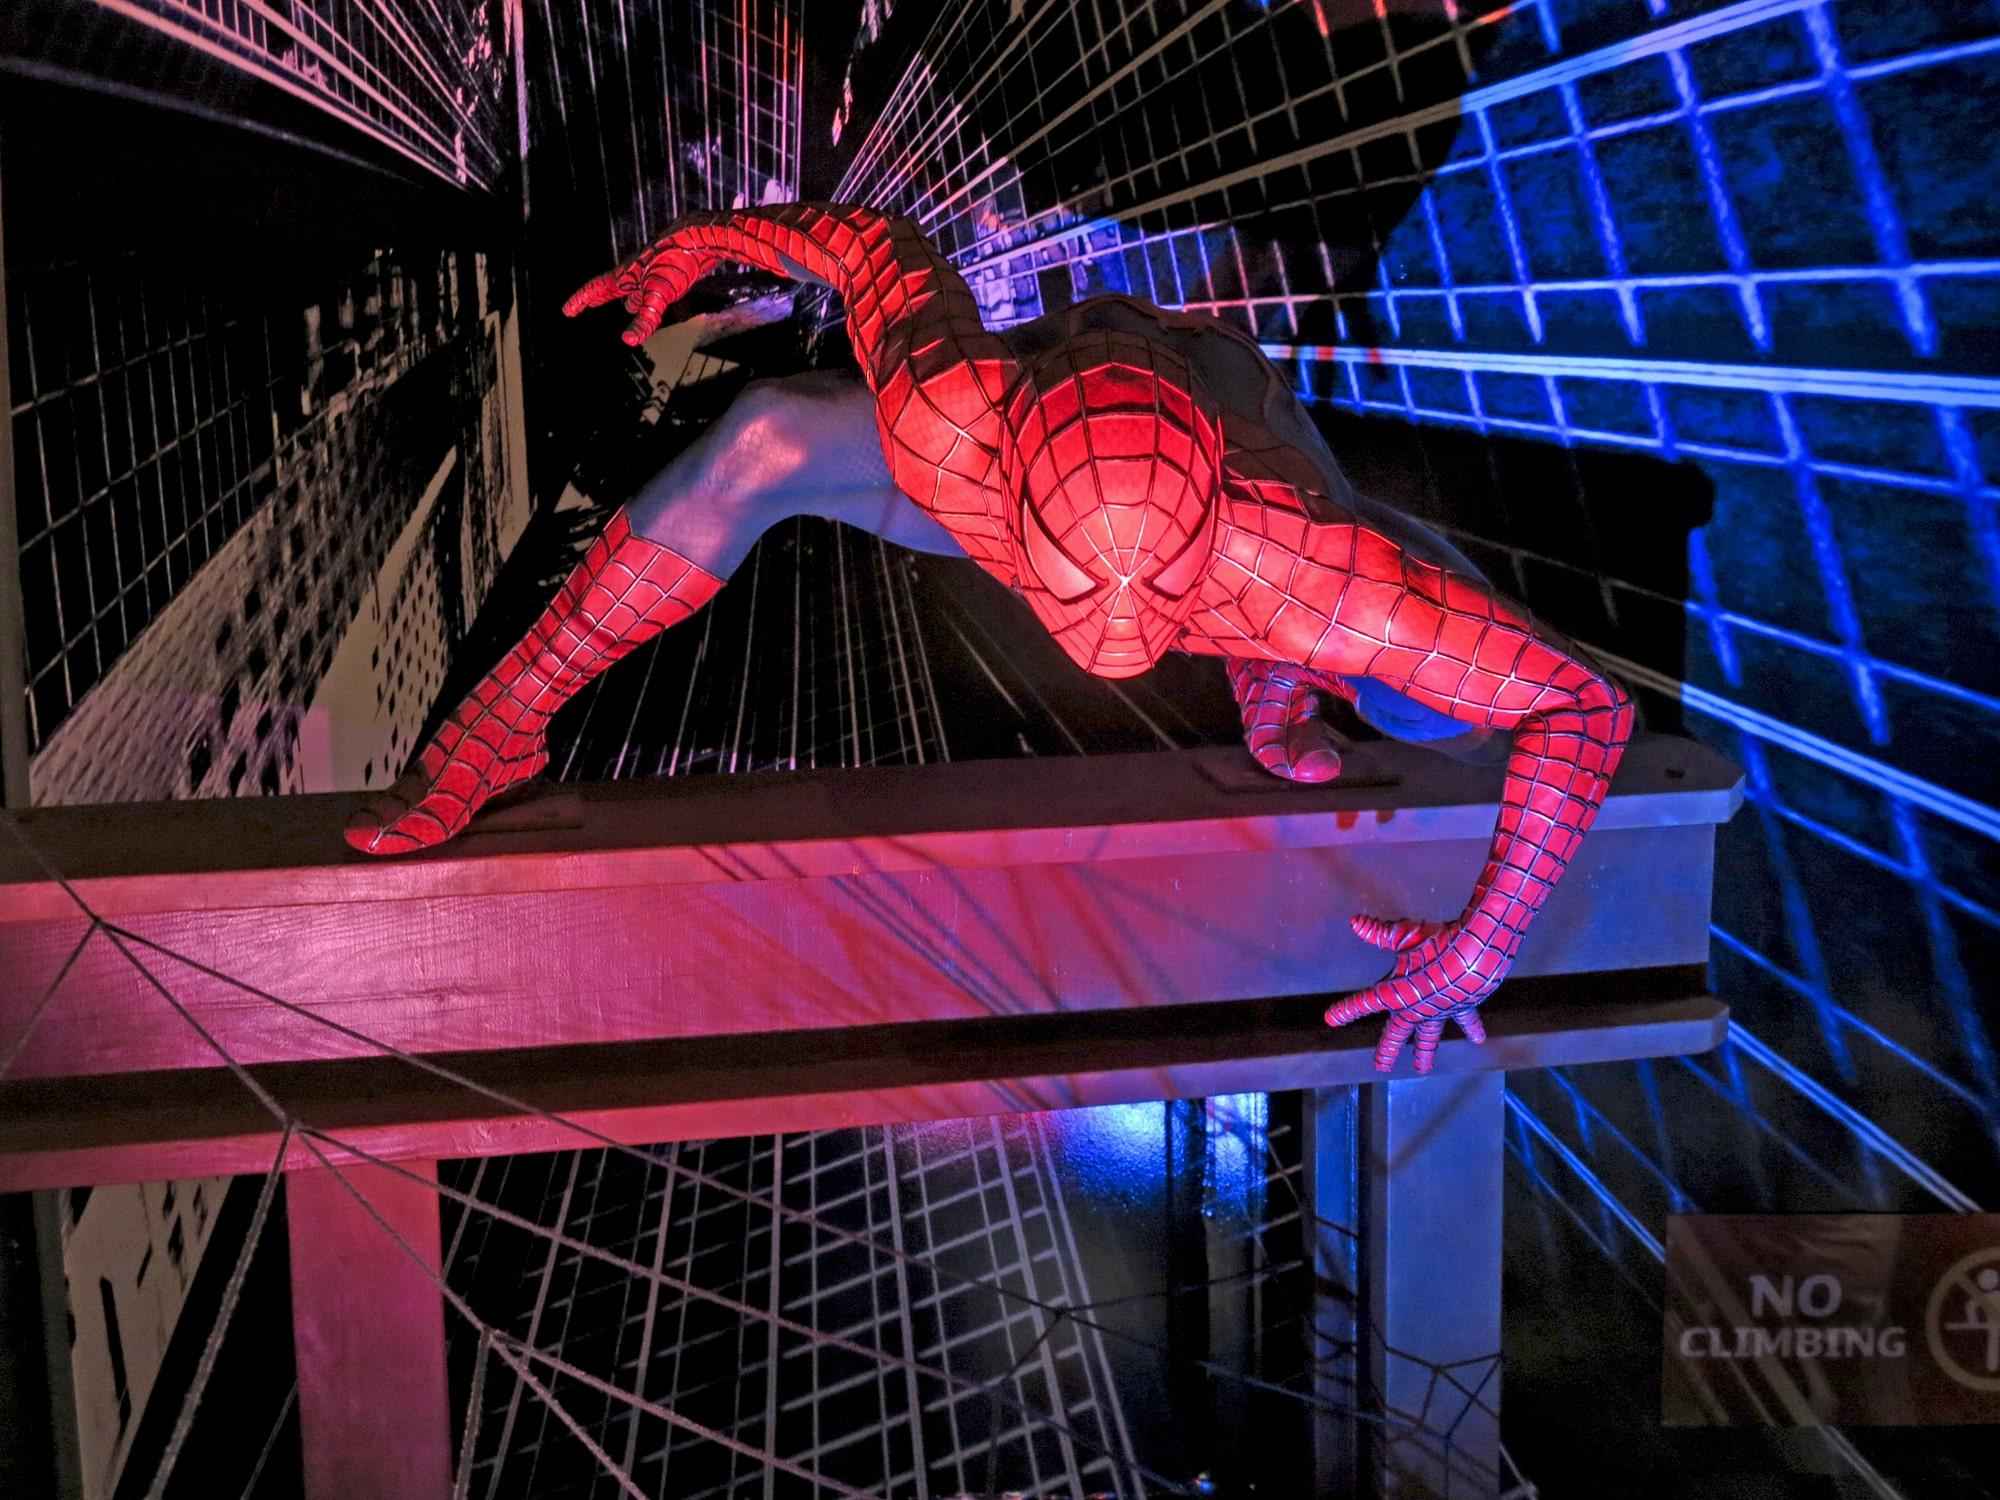 Sony Pictures опровергла слухи о появлении Эндрю Гарфилда и Тоби Магуайра в новом «Человеке-пауке»